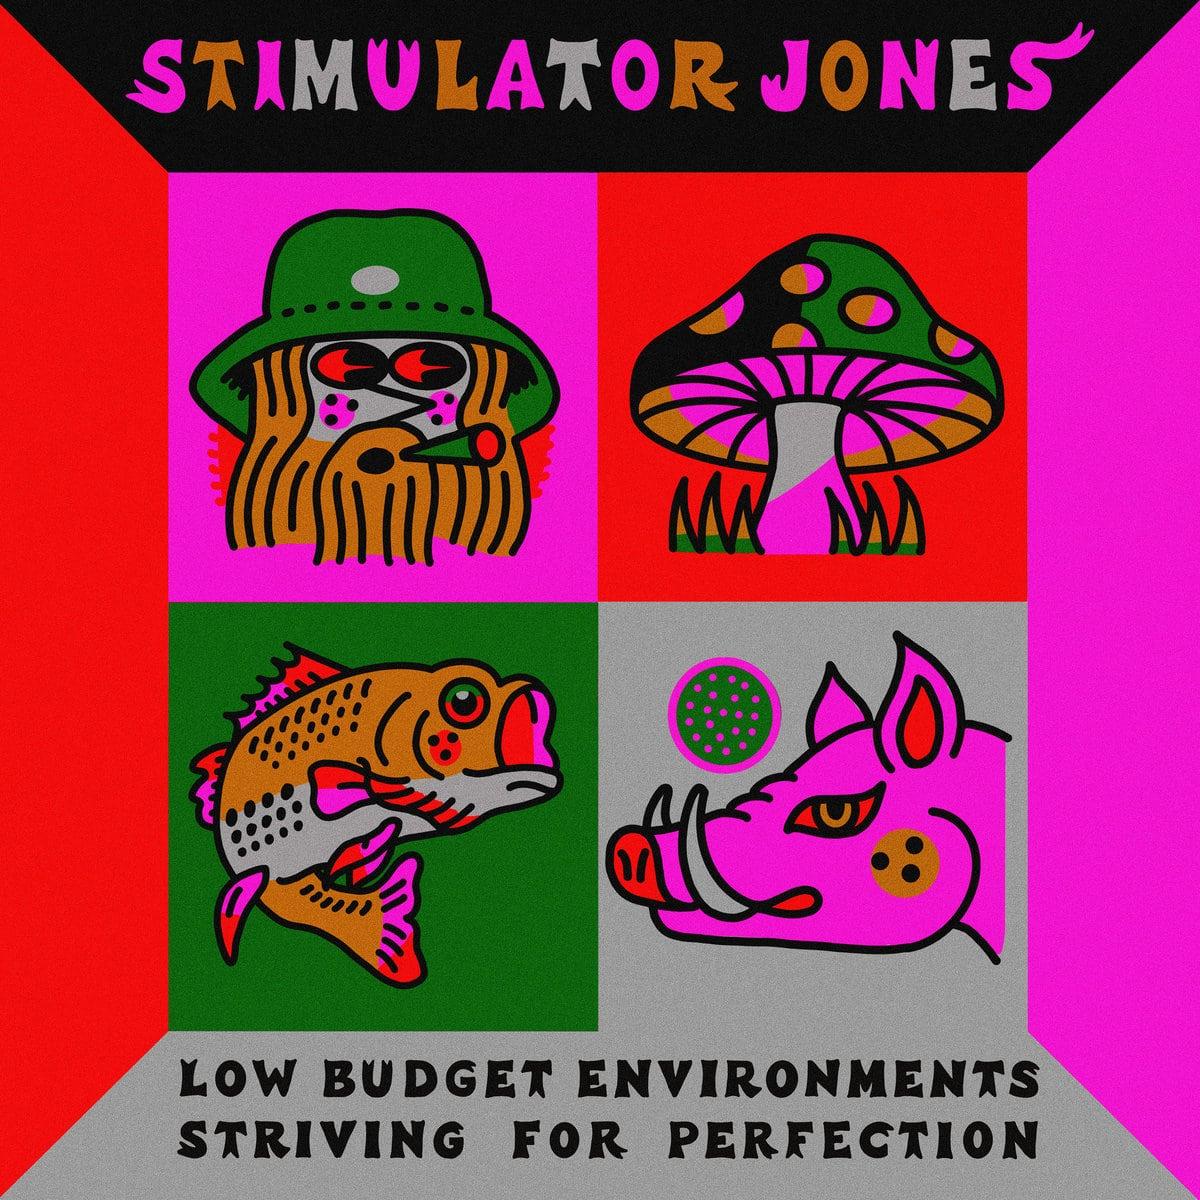 Stimulator Jones Low Budget Environments